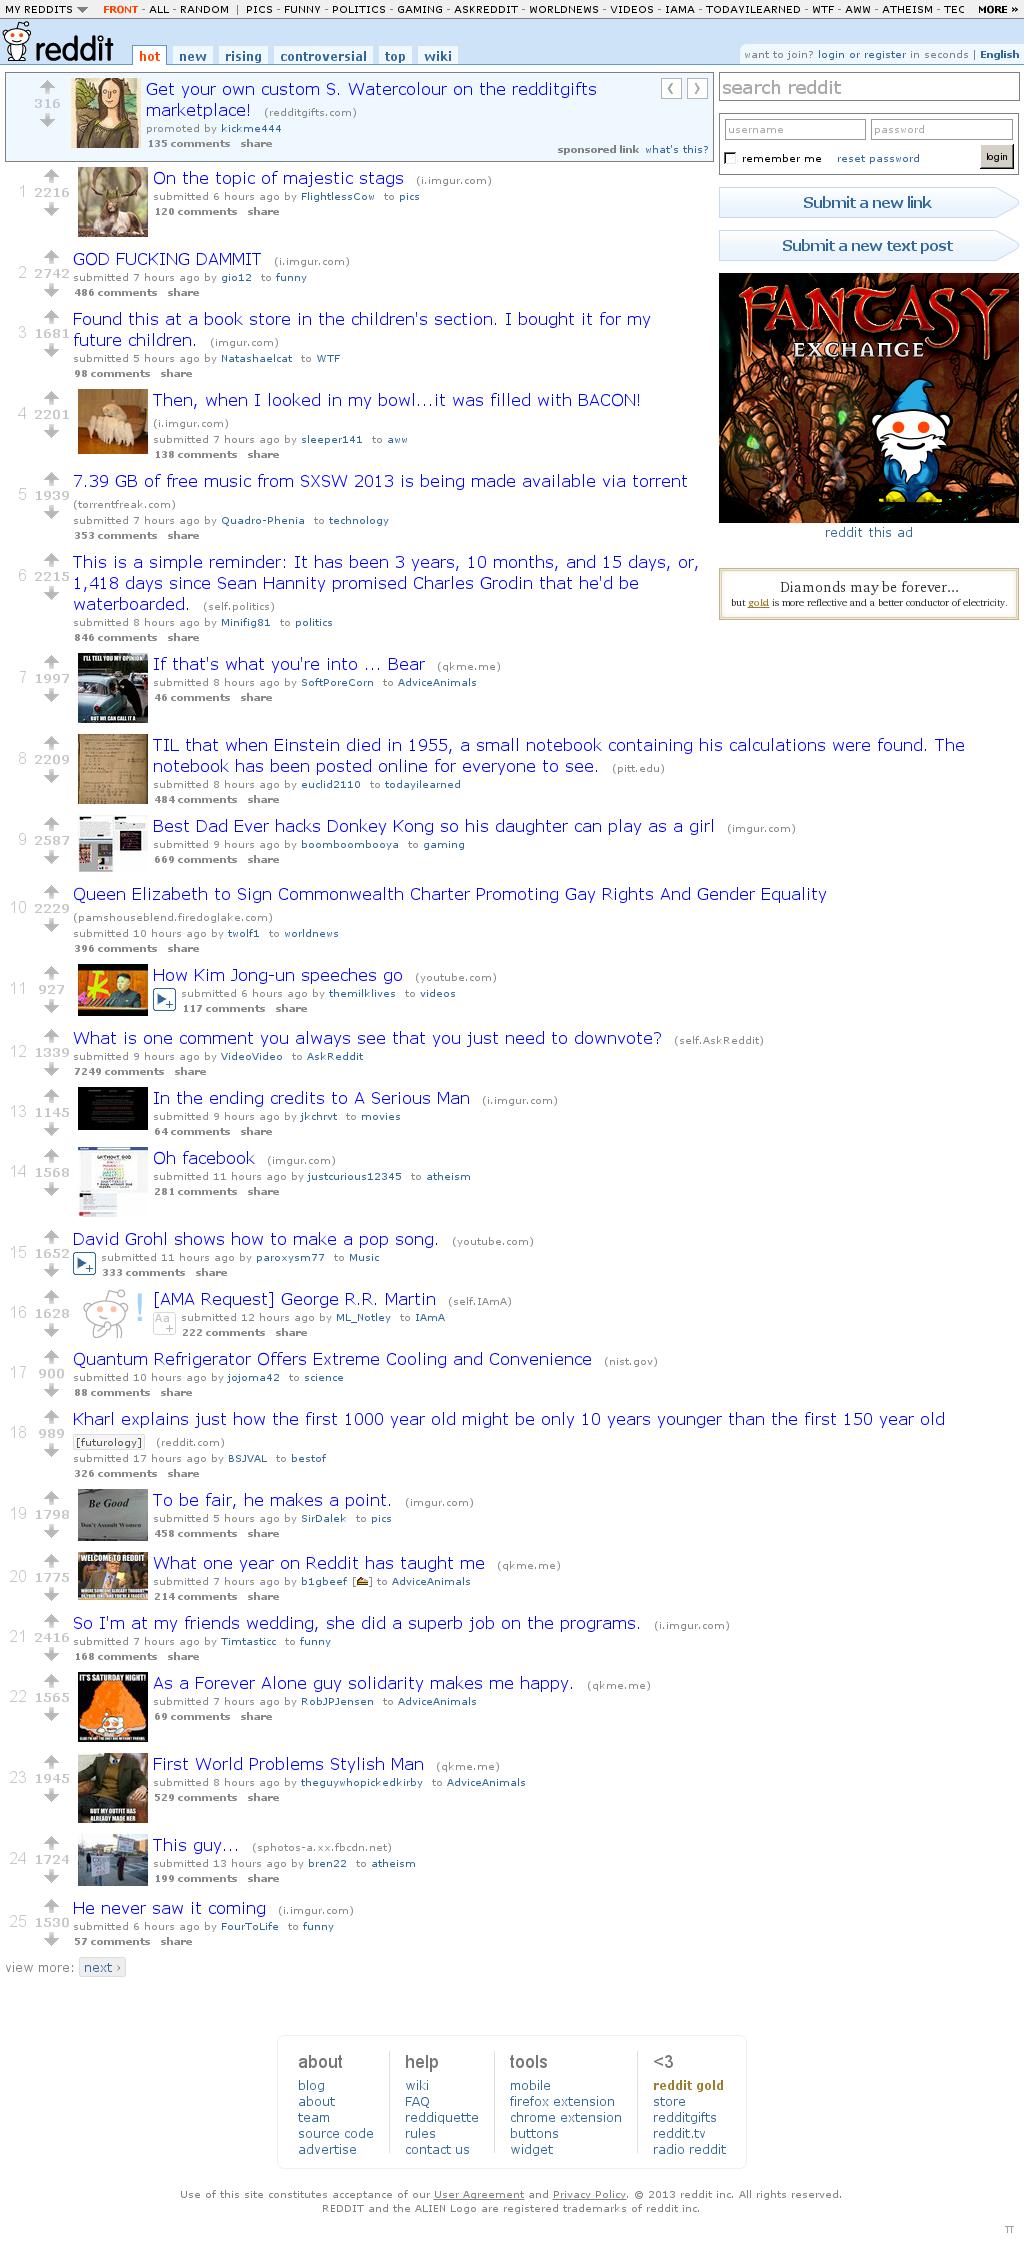 Reddit at Sunday March 10, 2013, 11:17 a.m. UTC